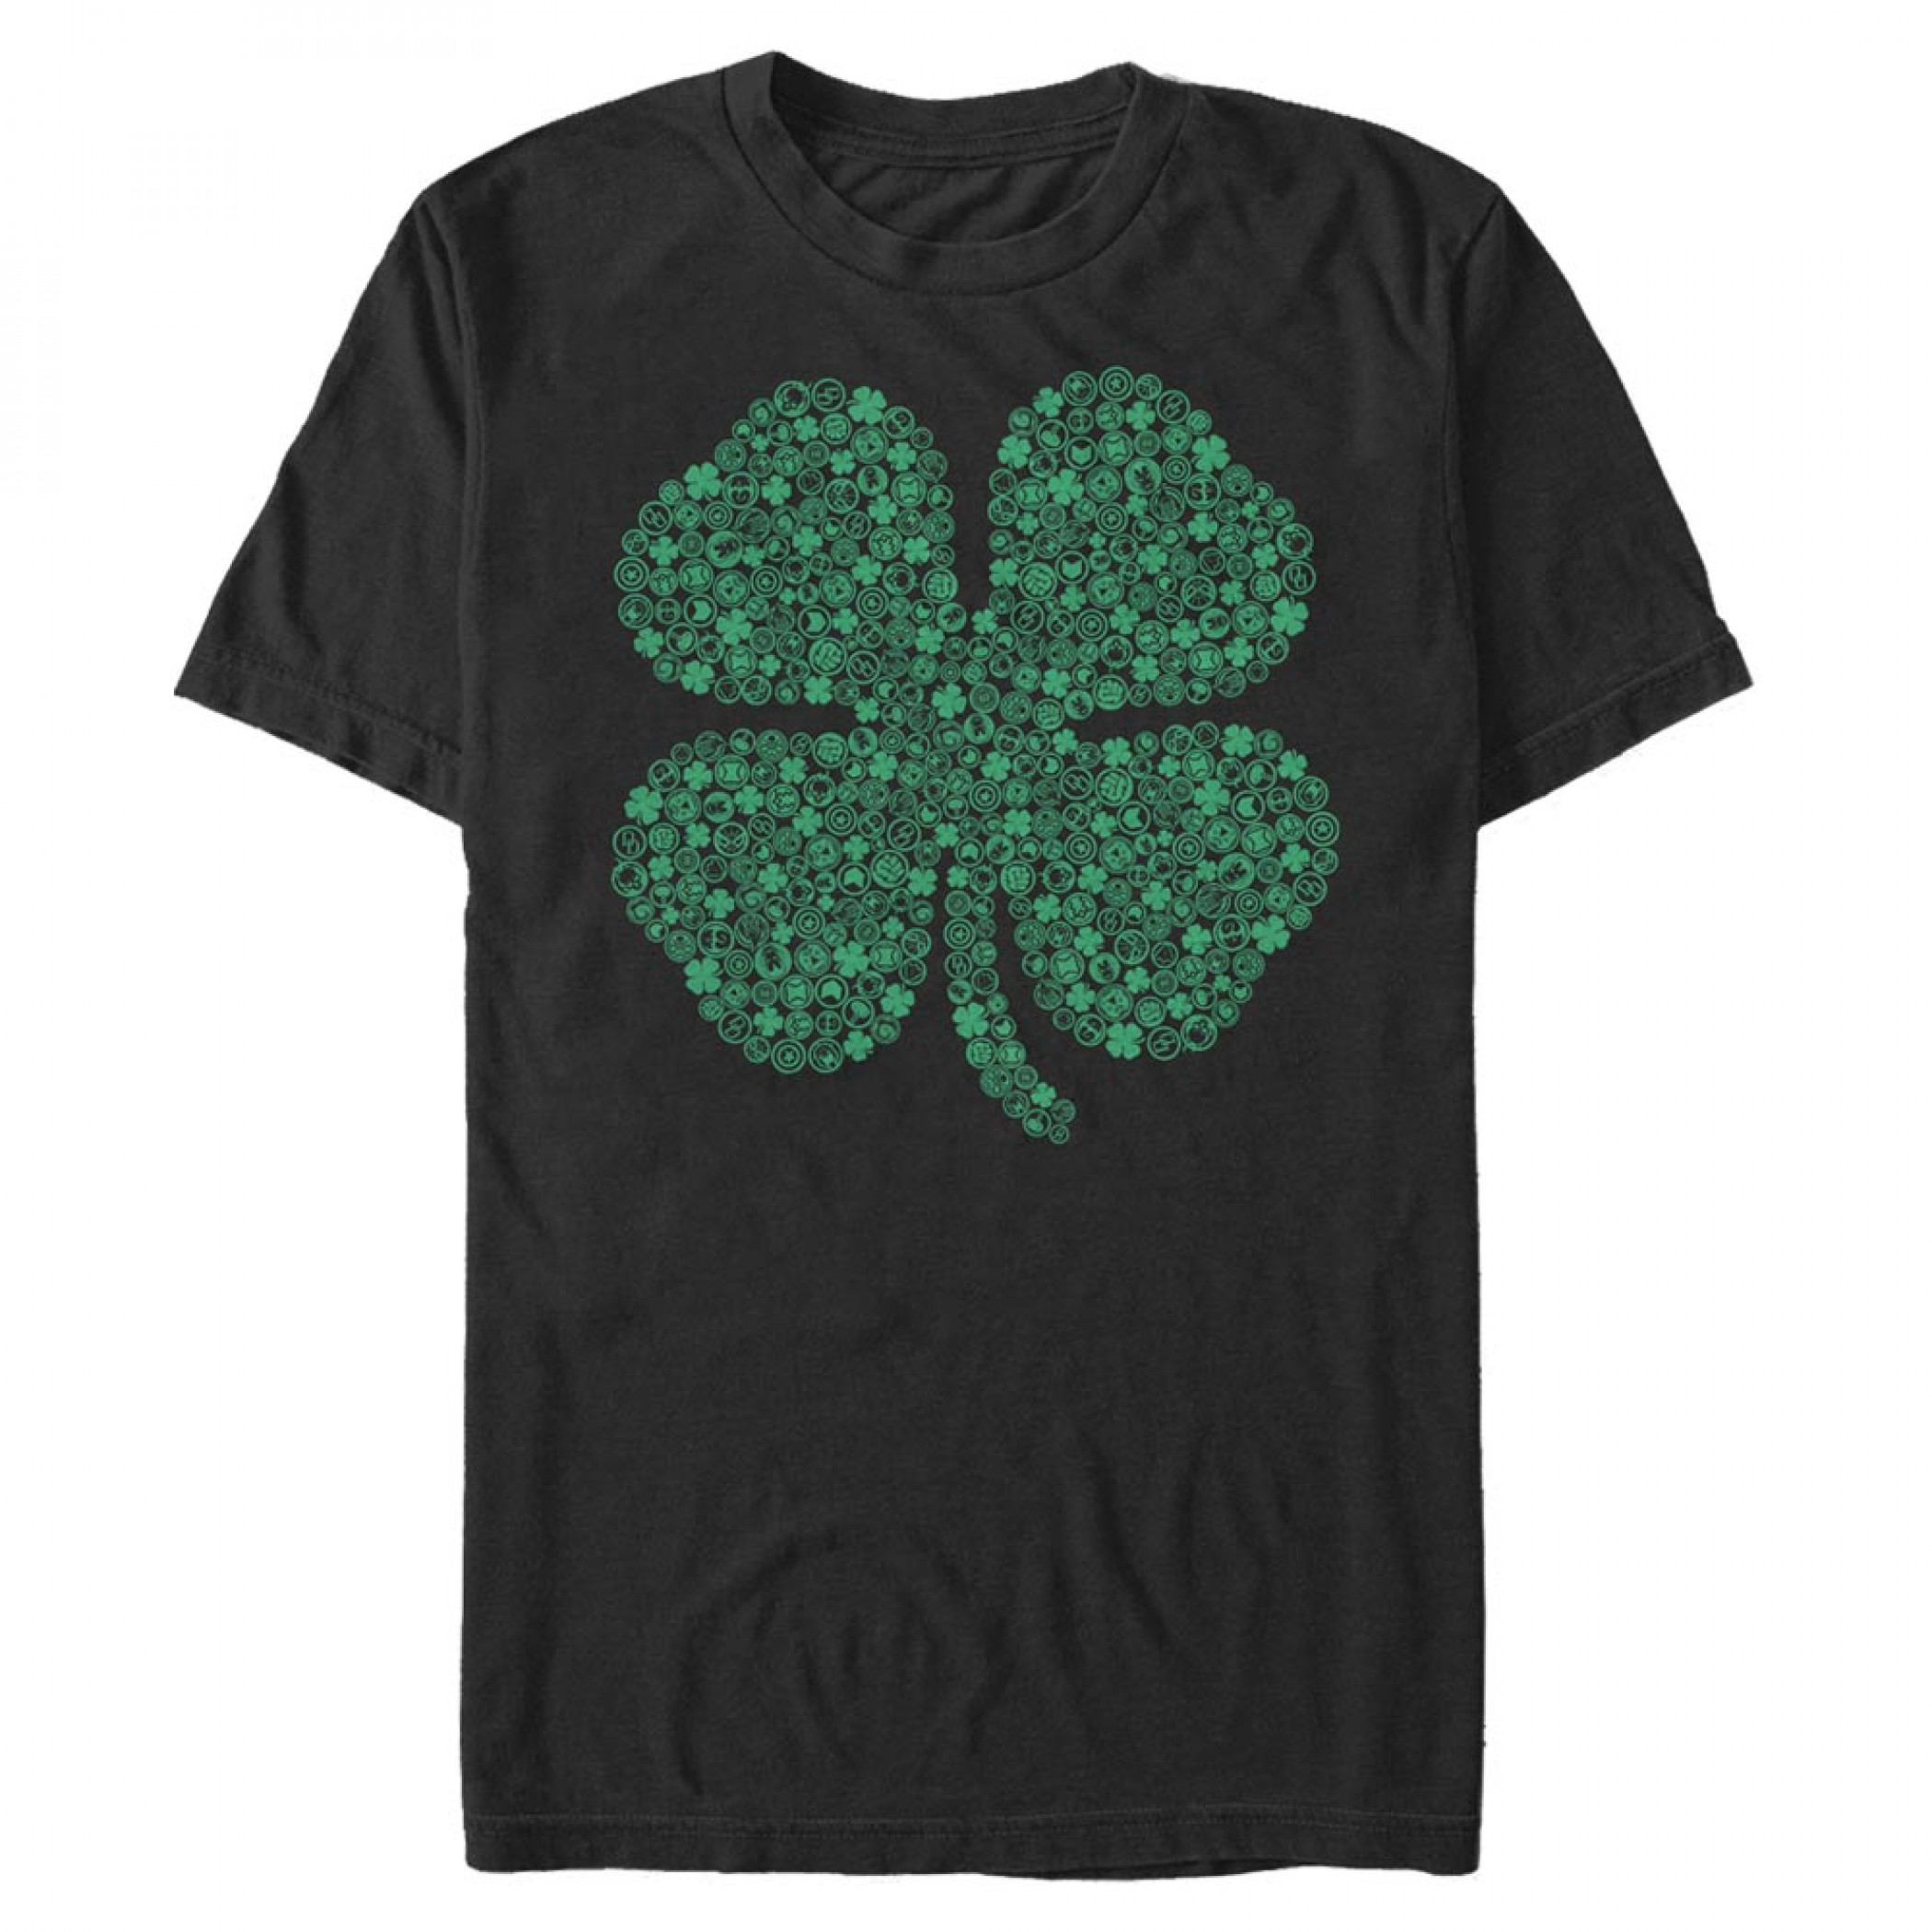 Avengers Logos Shamrock St. Patrick's Day T-Shirt